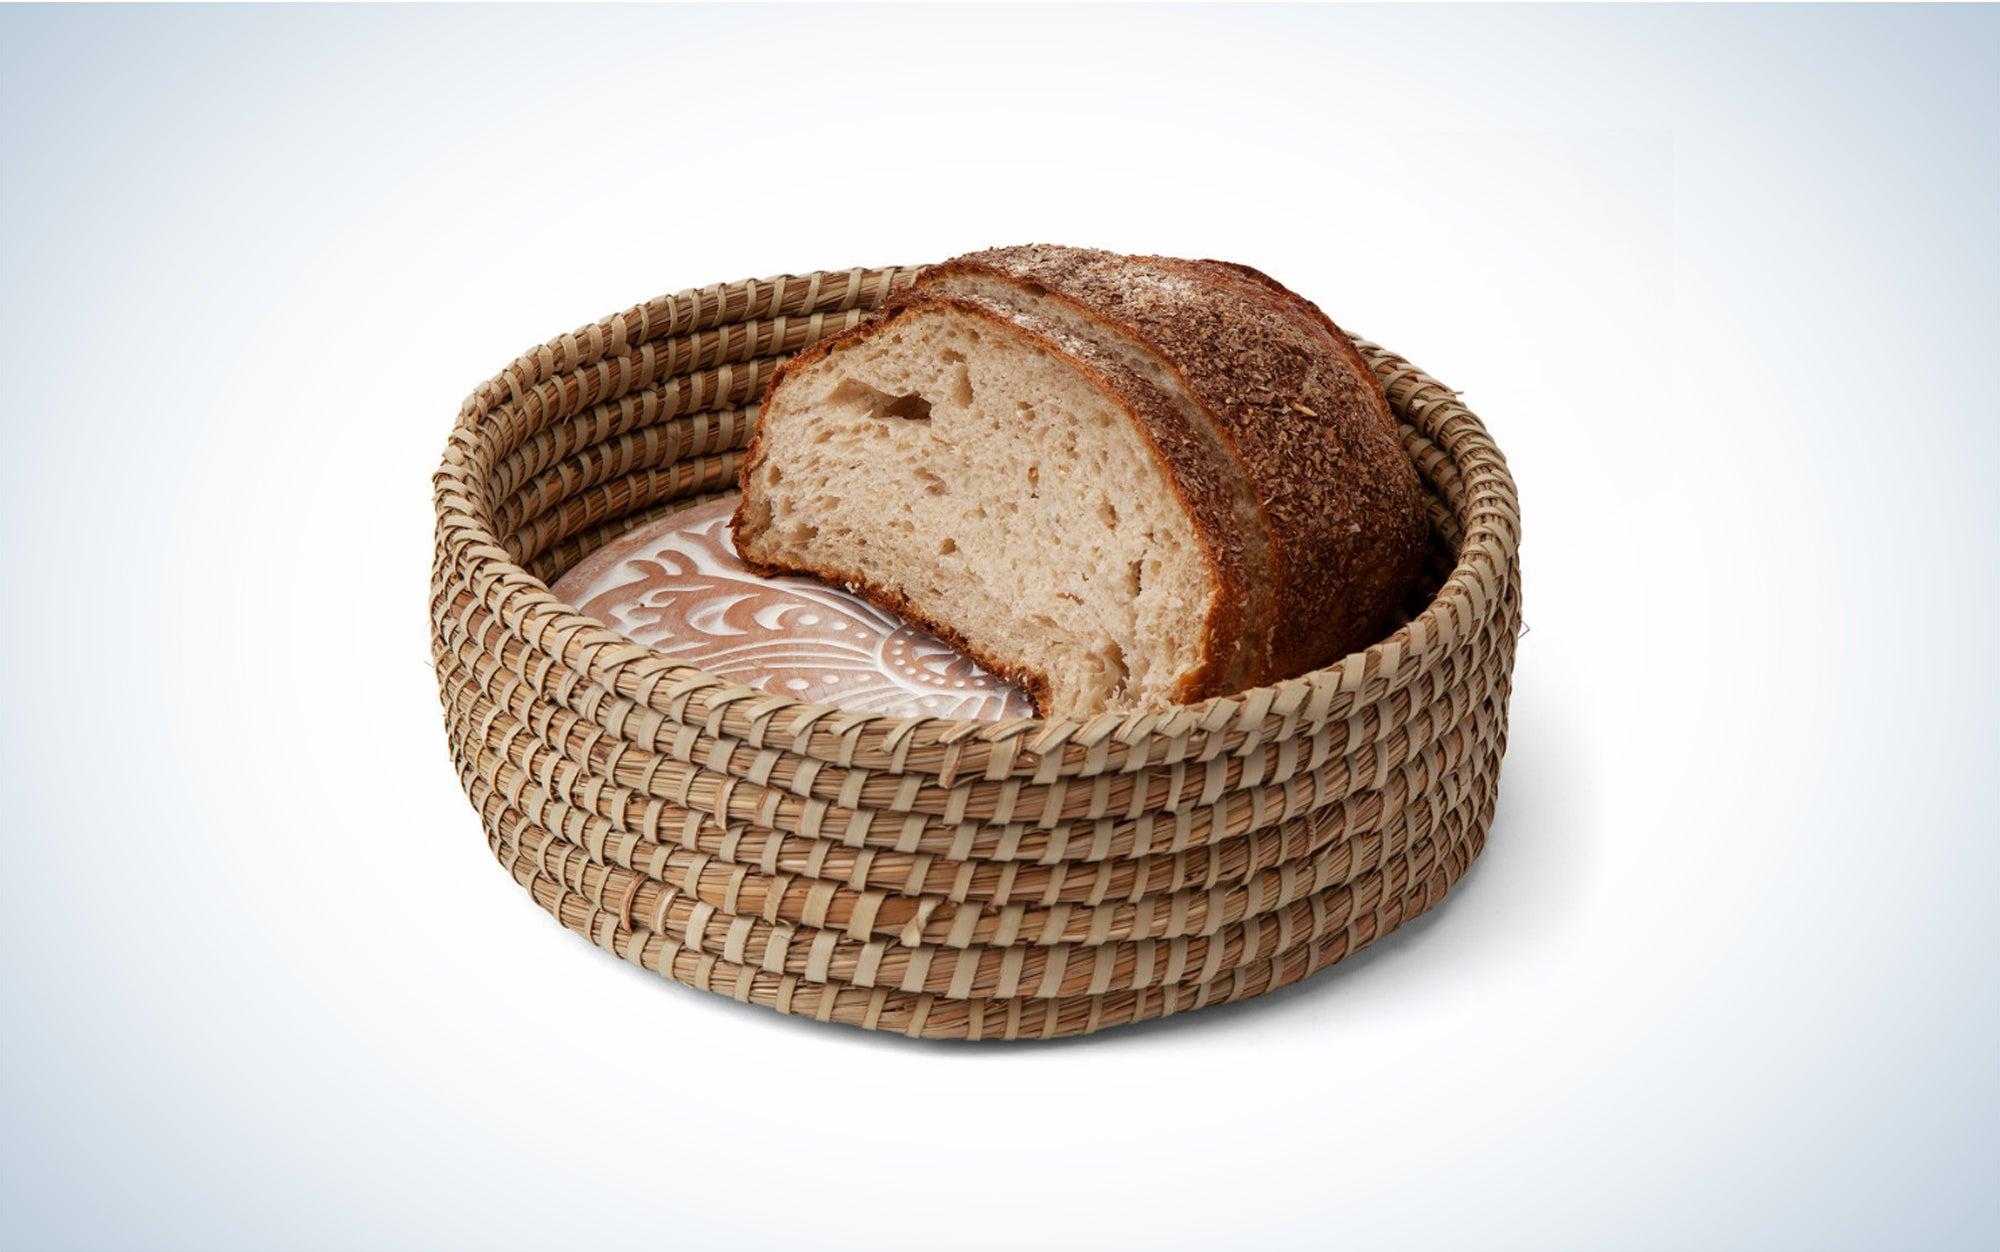 Traditional Bread Warming Set